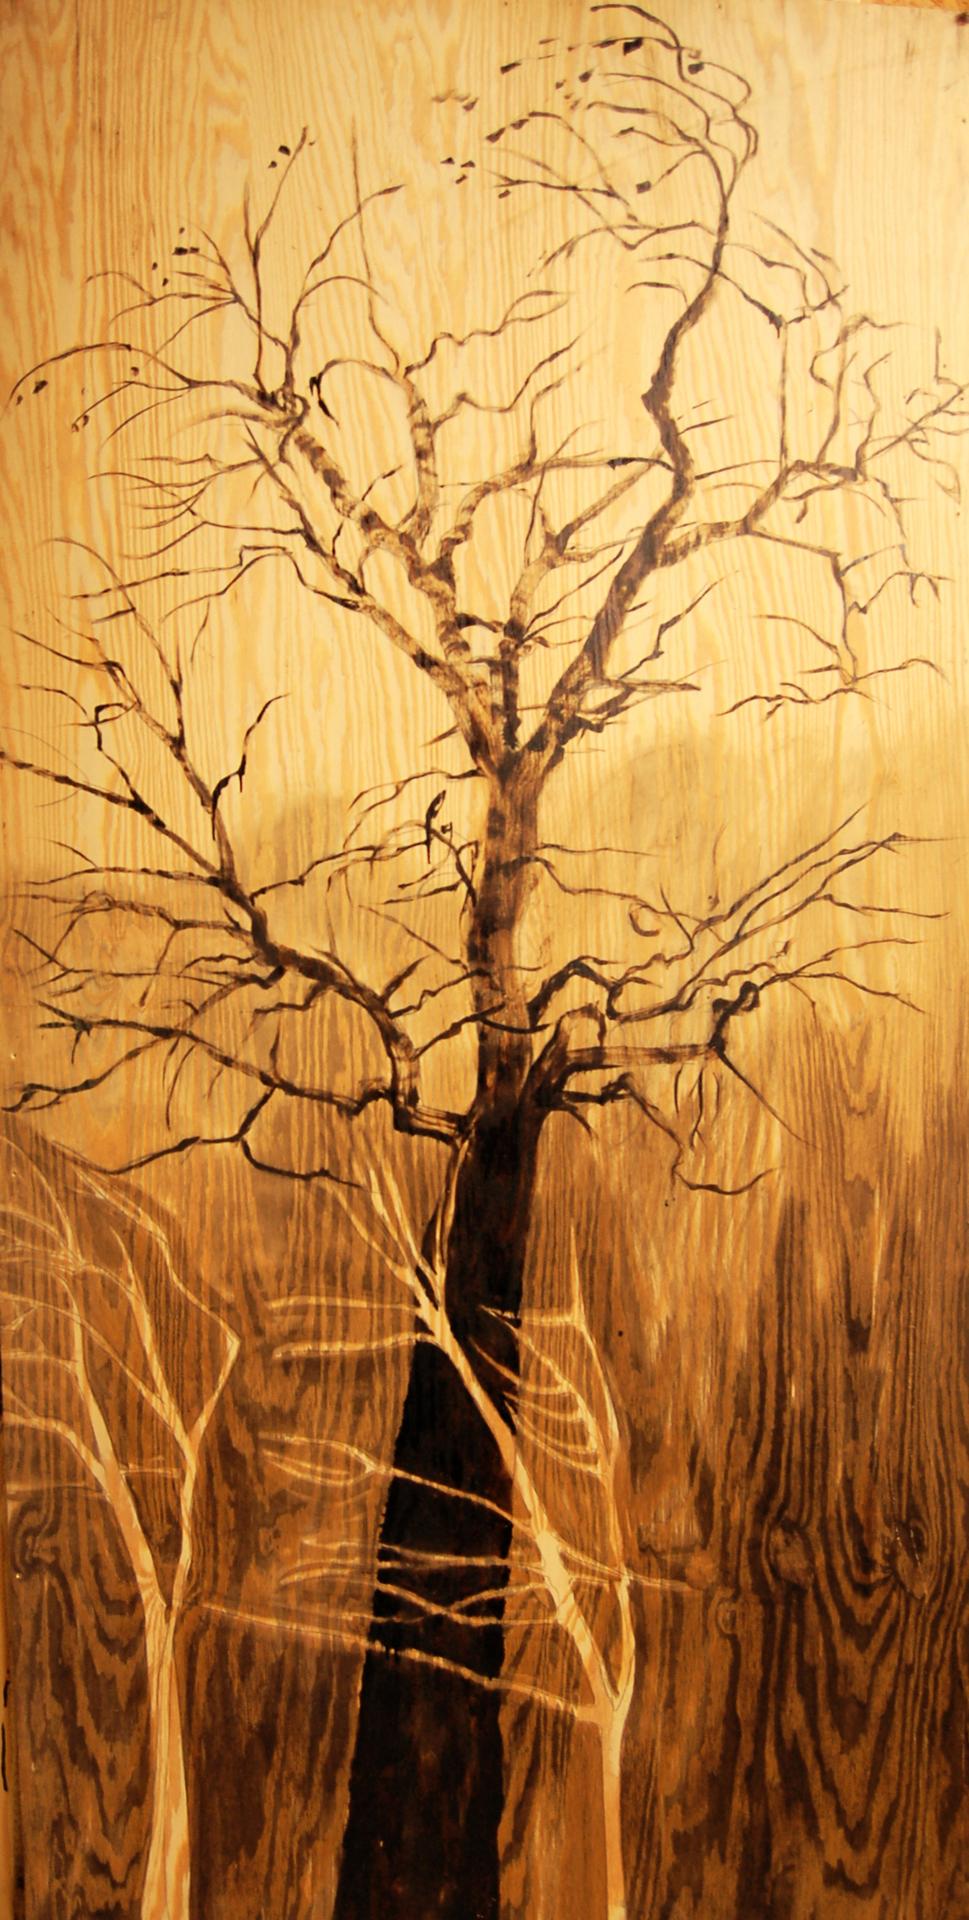 Trees in Season: Cottonwood and saplings